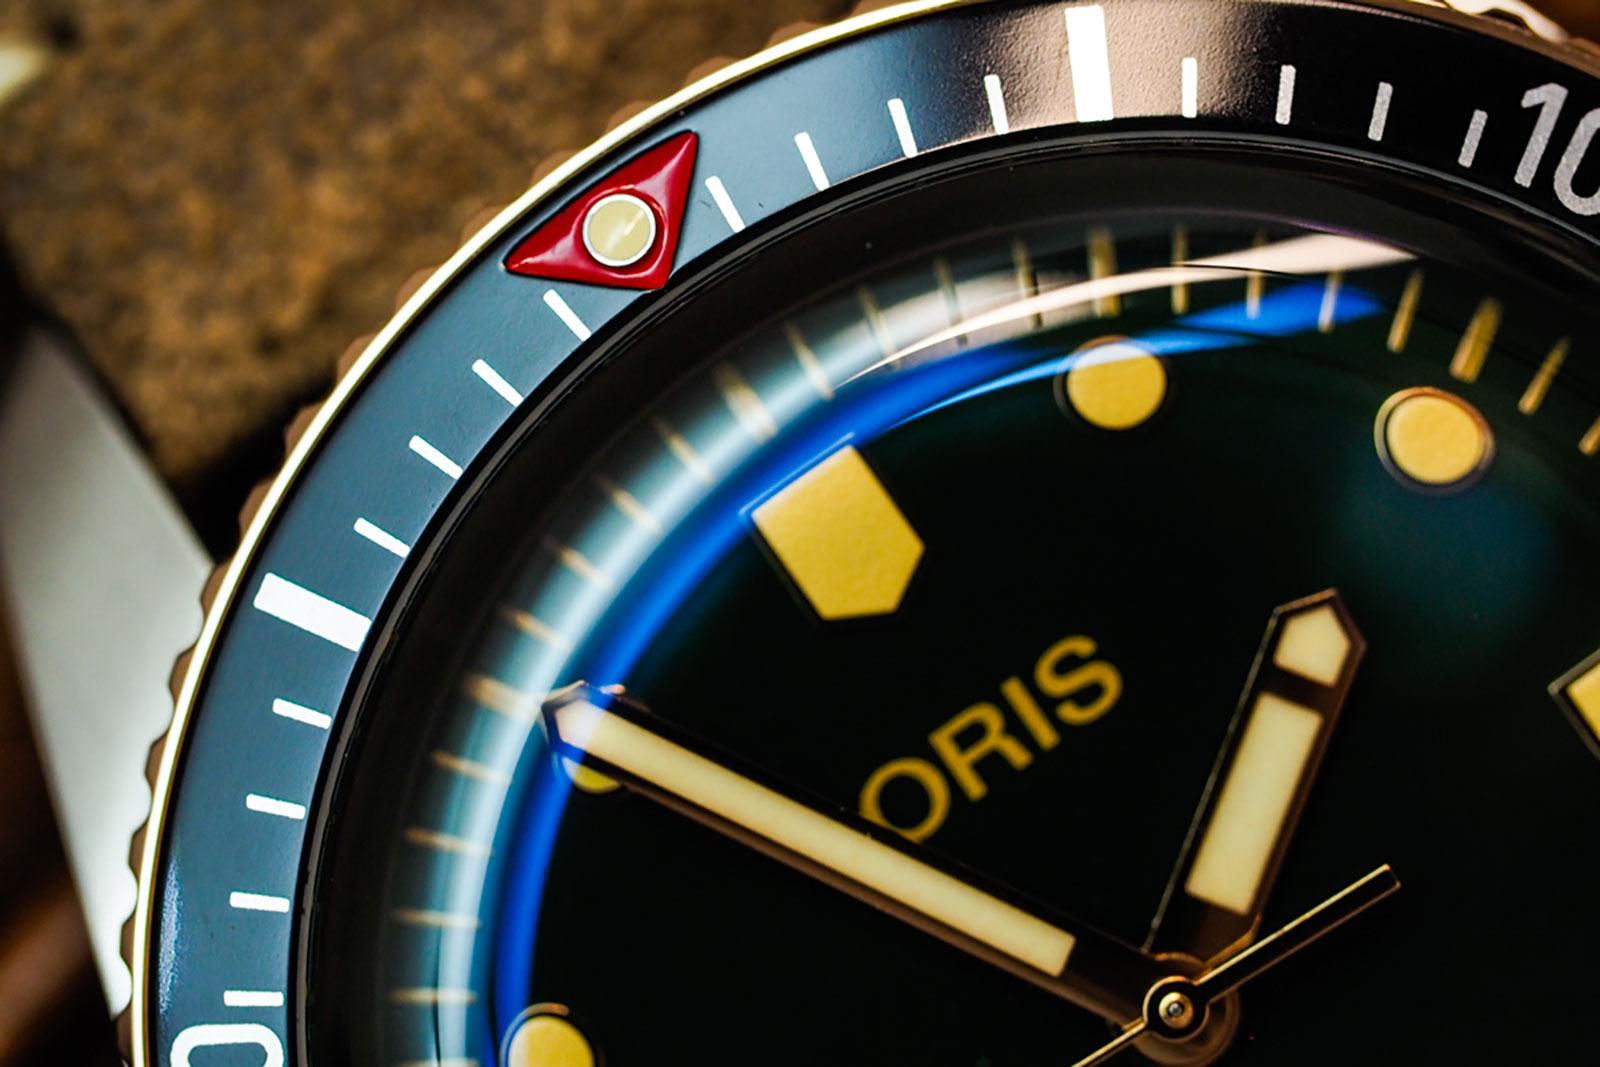 Oris Diver 65 CTIME 3